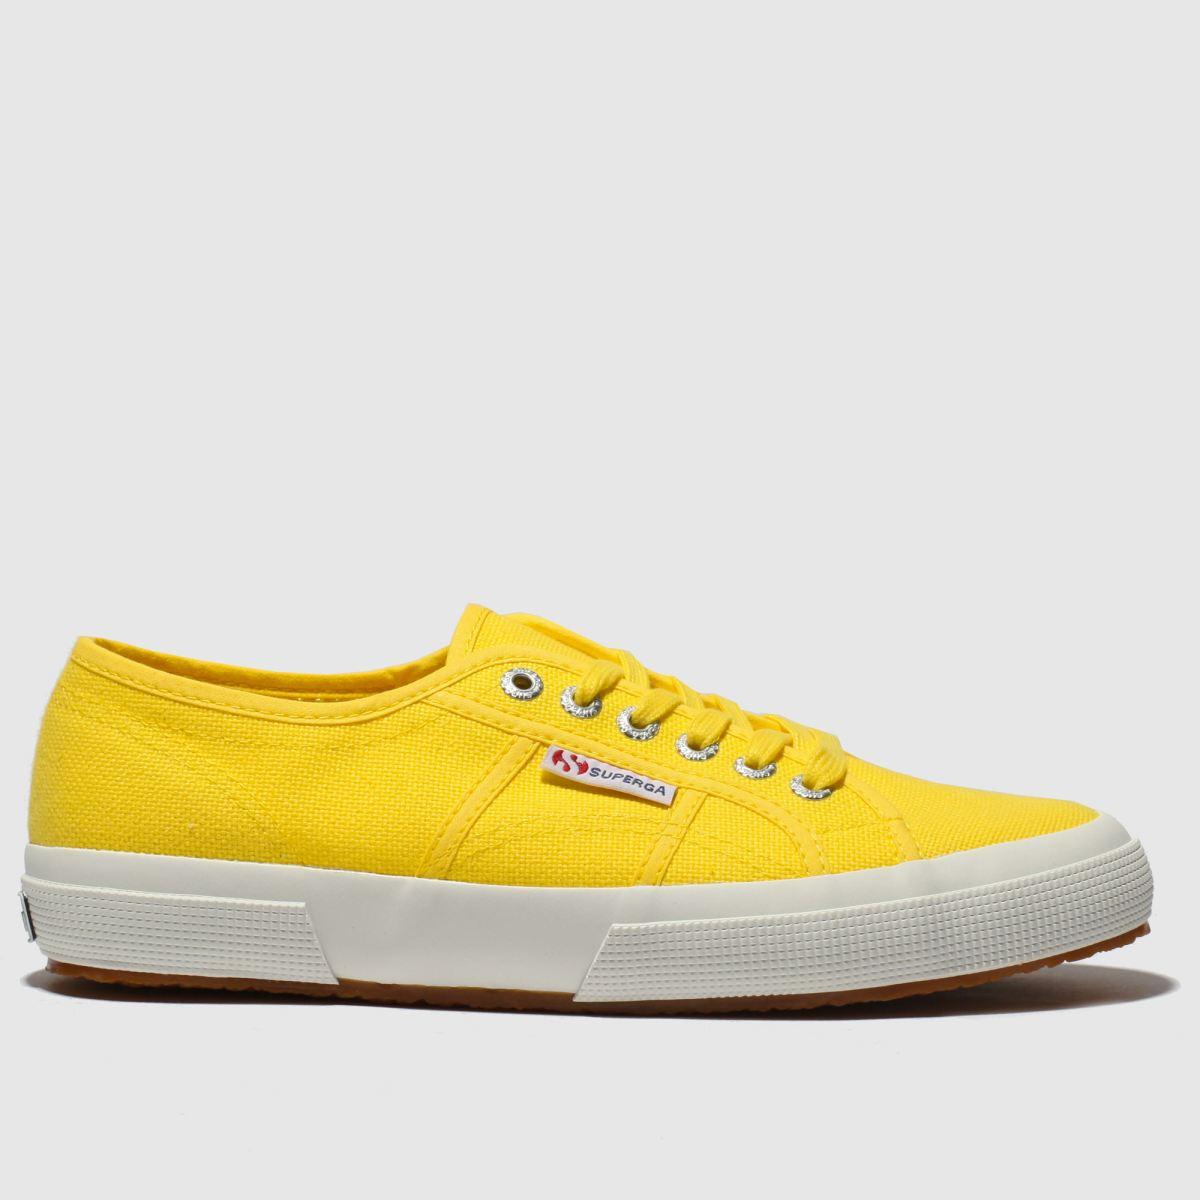 Superga Yellow 2750 Cotu Classic Trainers